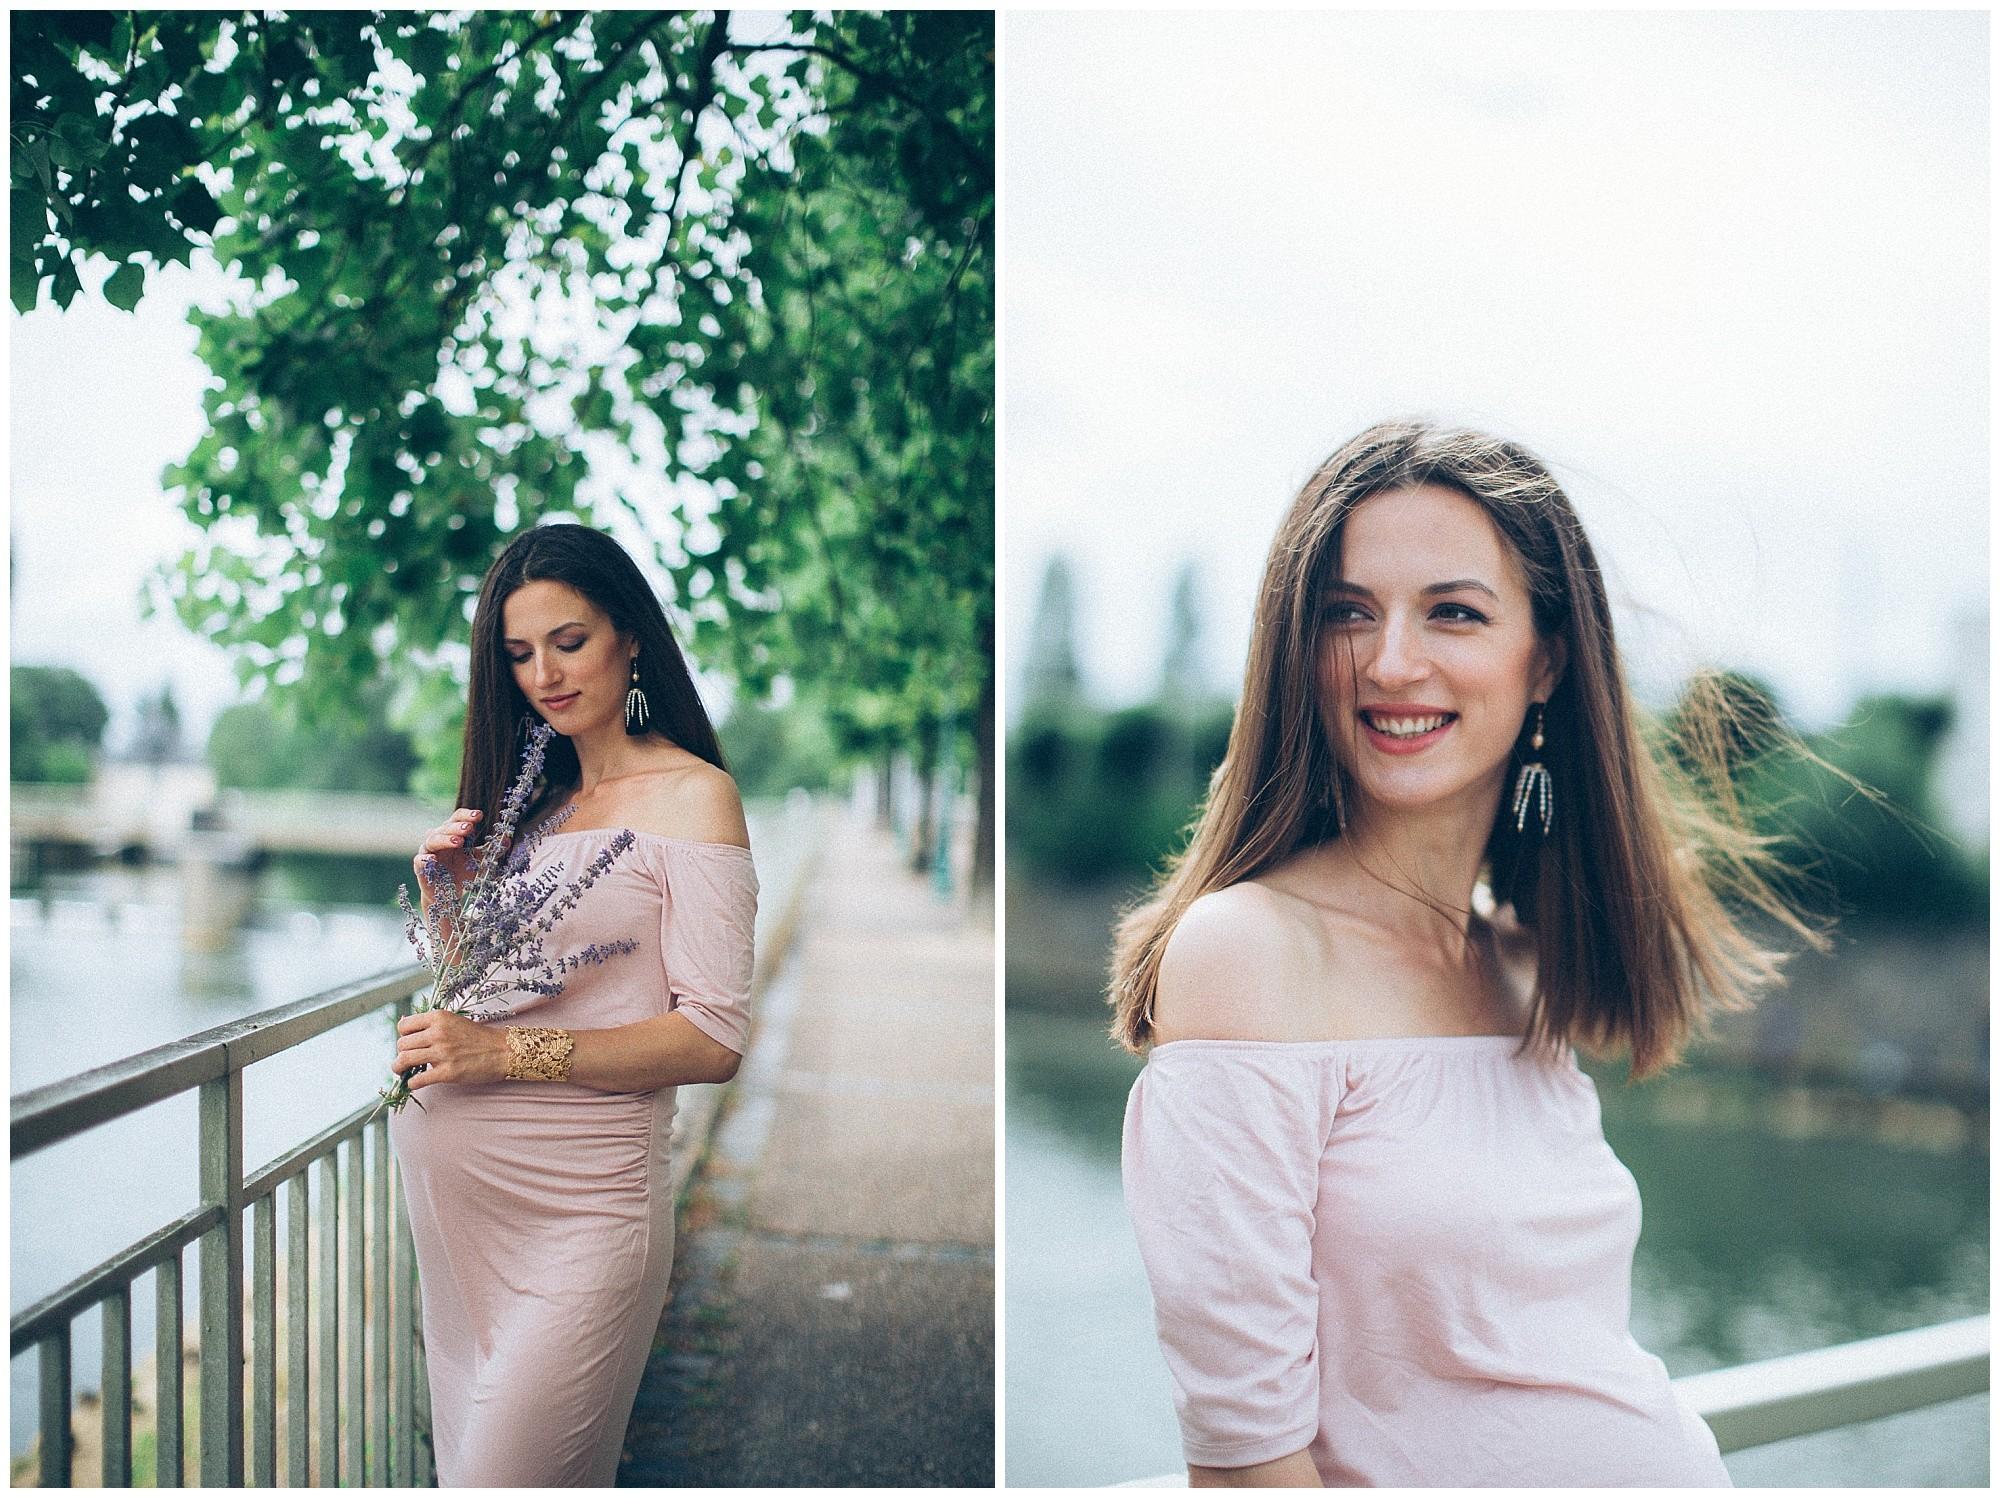 Kateryna-photos-photographe-grossesse_le-mans_sarthe-maternite-famille_0045.jpg